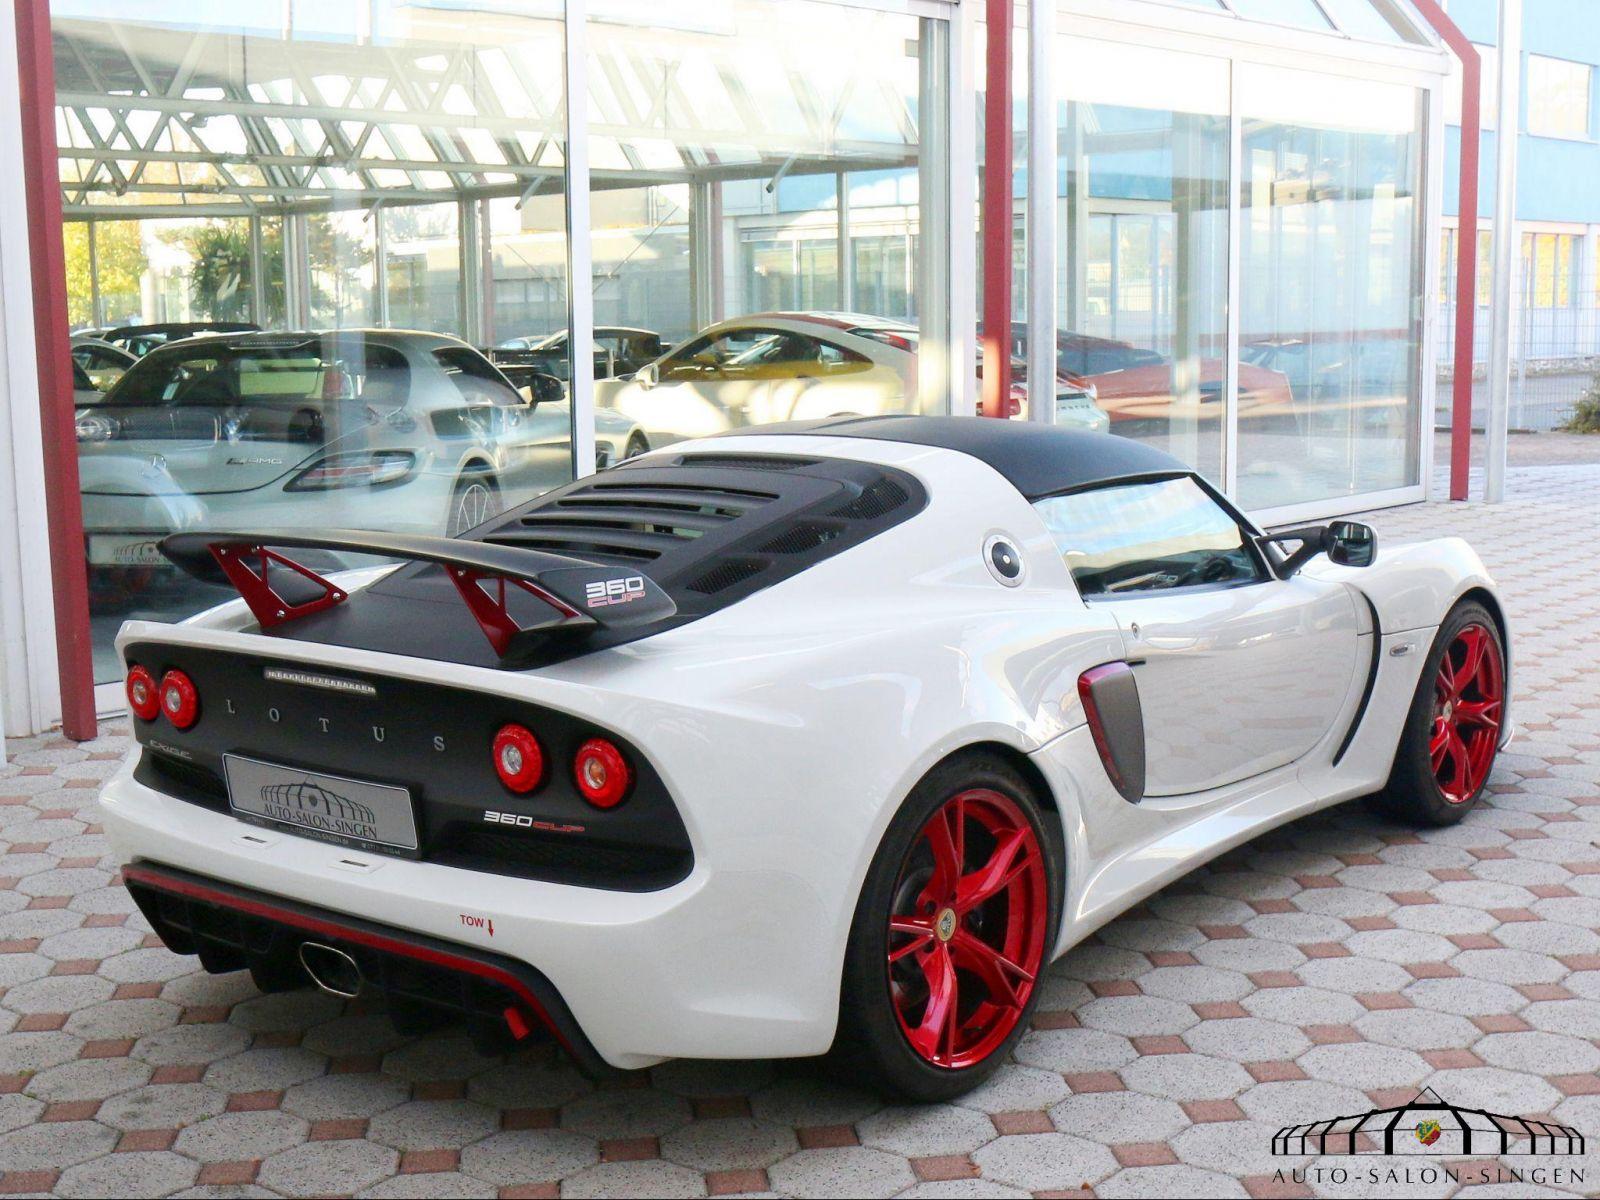 https://www.auto-salon-singen.de/generate/vehicle/59dbea853b2da/lotus_exige_2ede26-1600x1200_crop.jpg